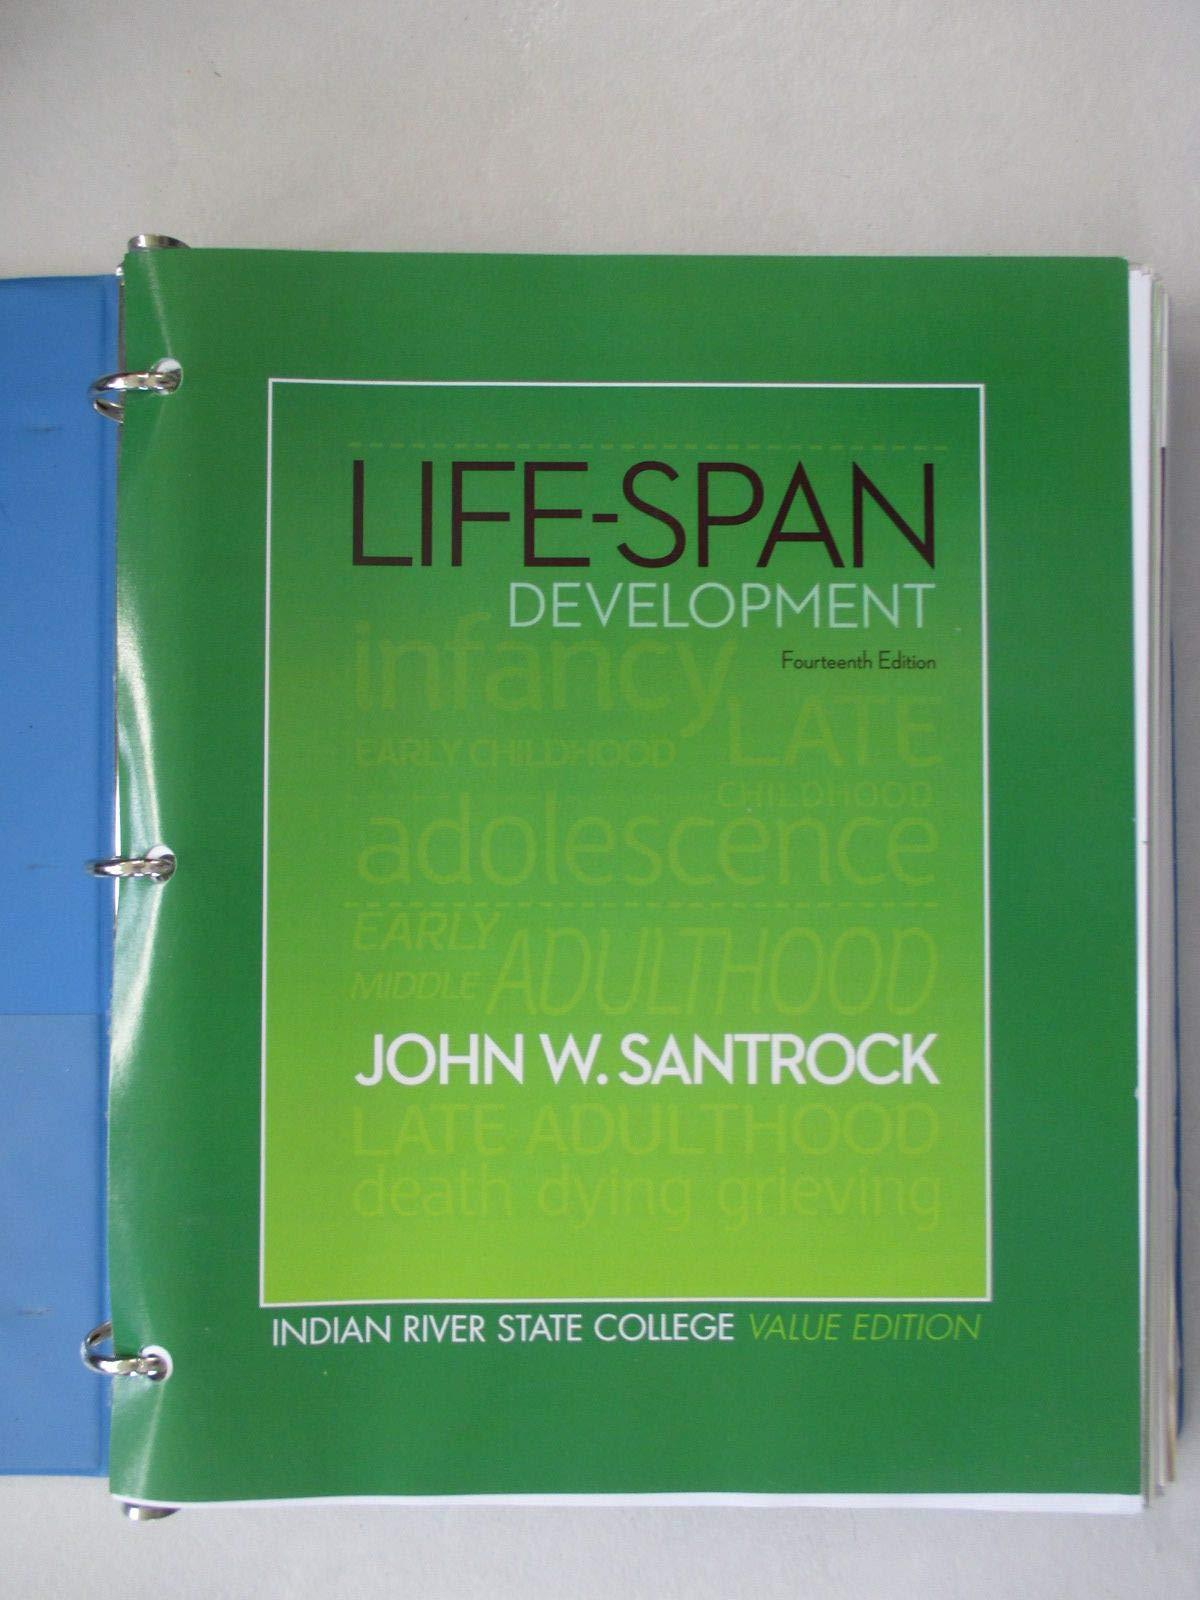 Life Span Development Fourteenth Edition John W Santrock 9780073399287 Amazon Com Books